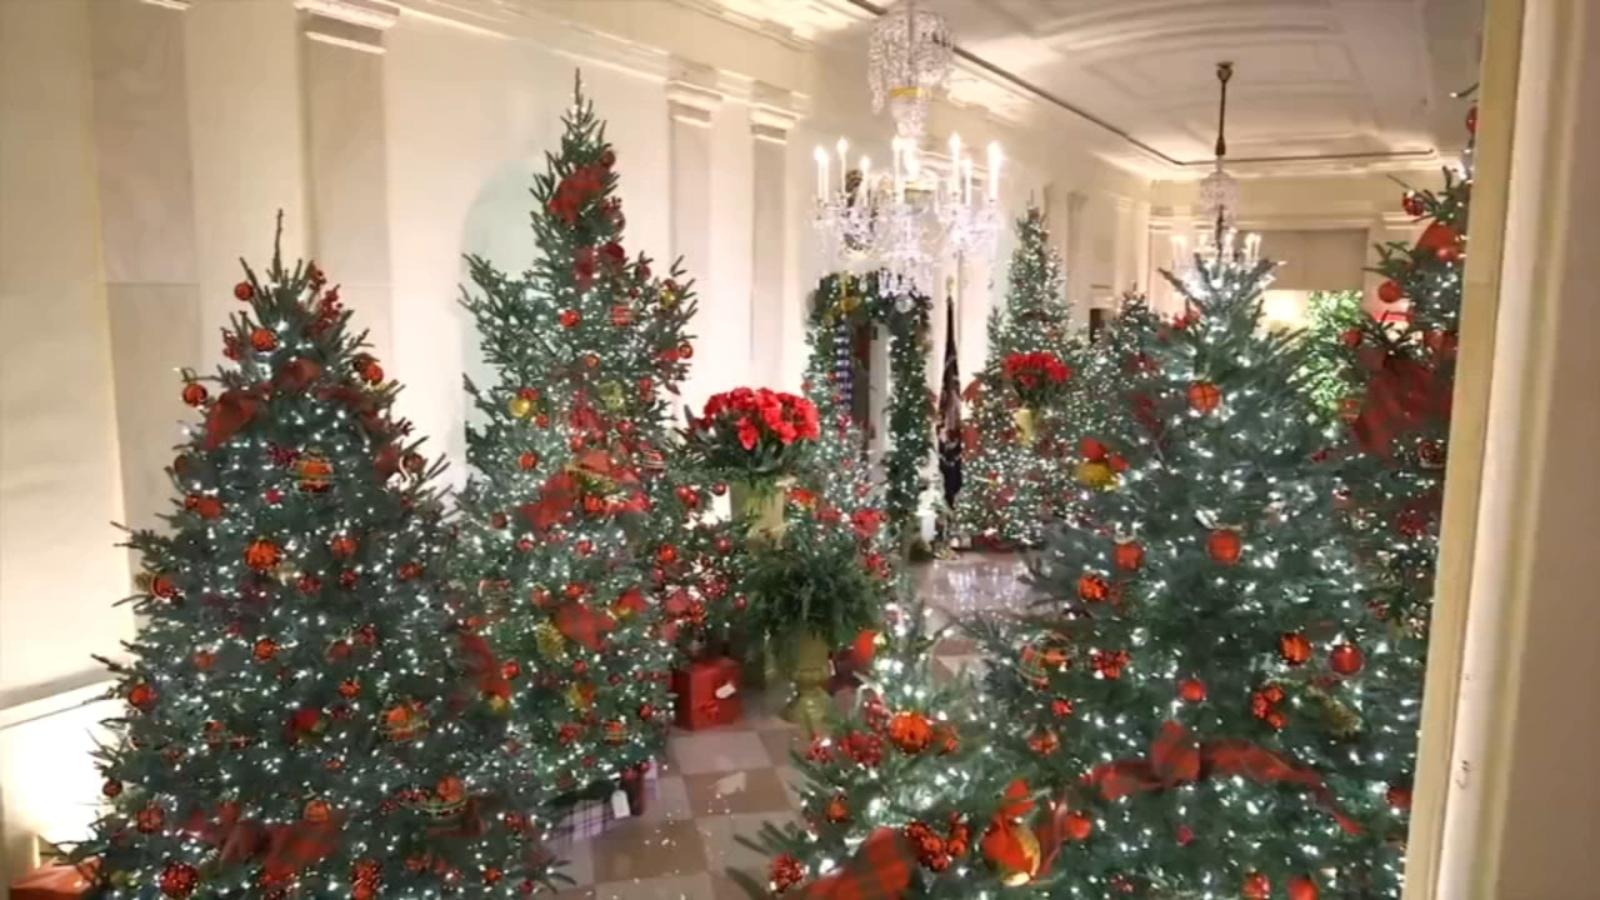 8385725 113020 wtvd white house christmas decorations 1min vid